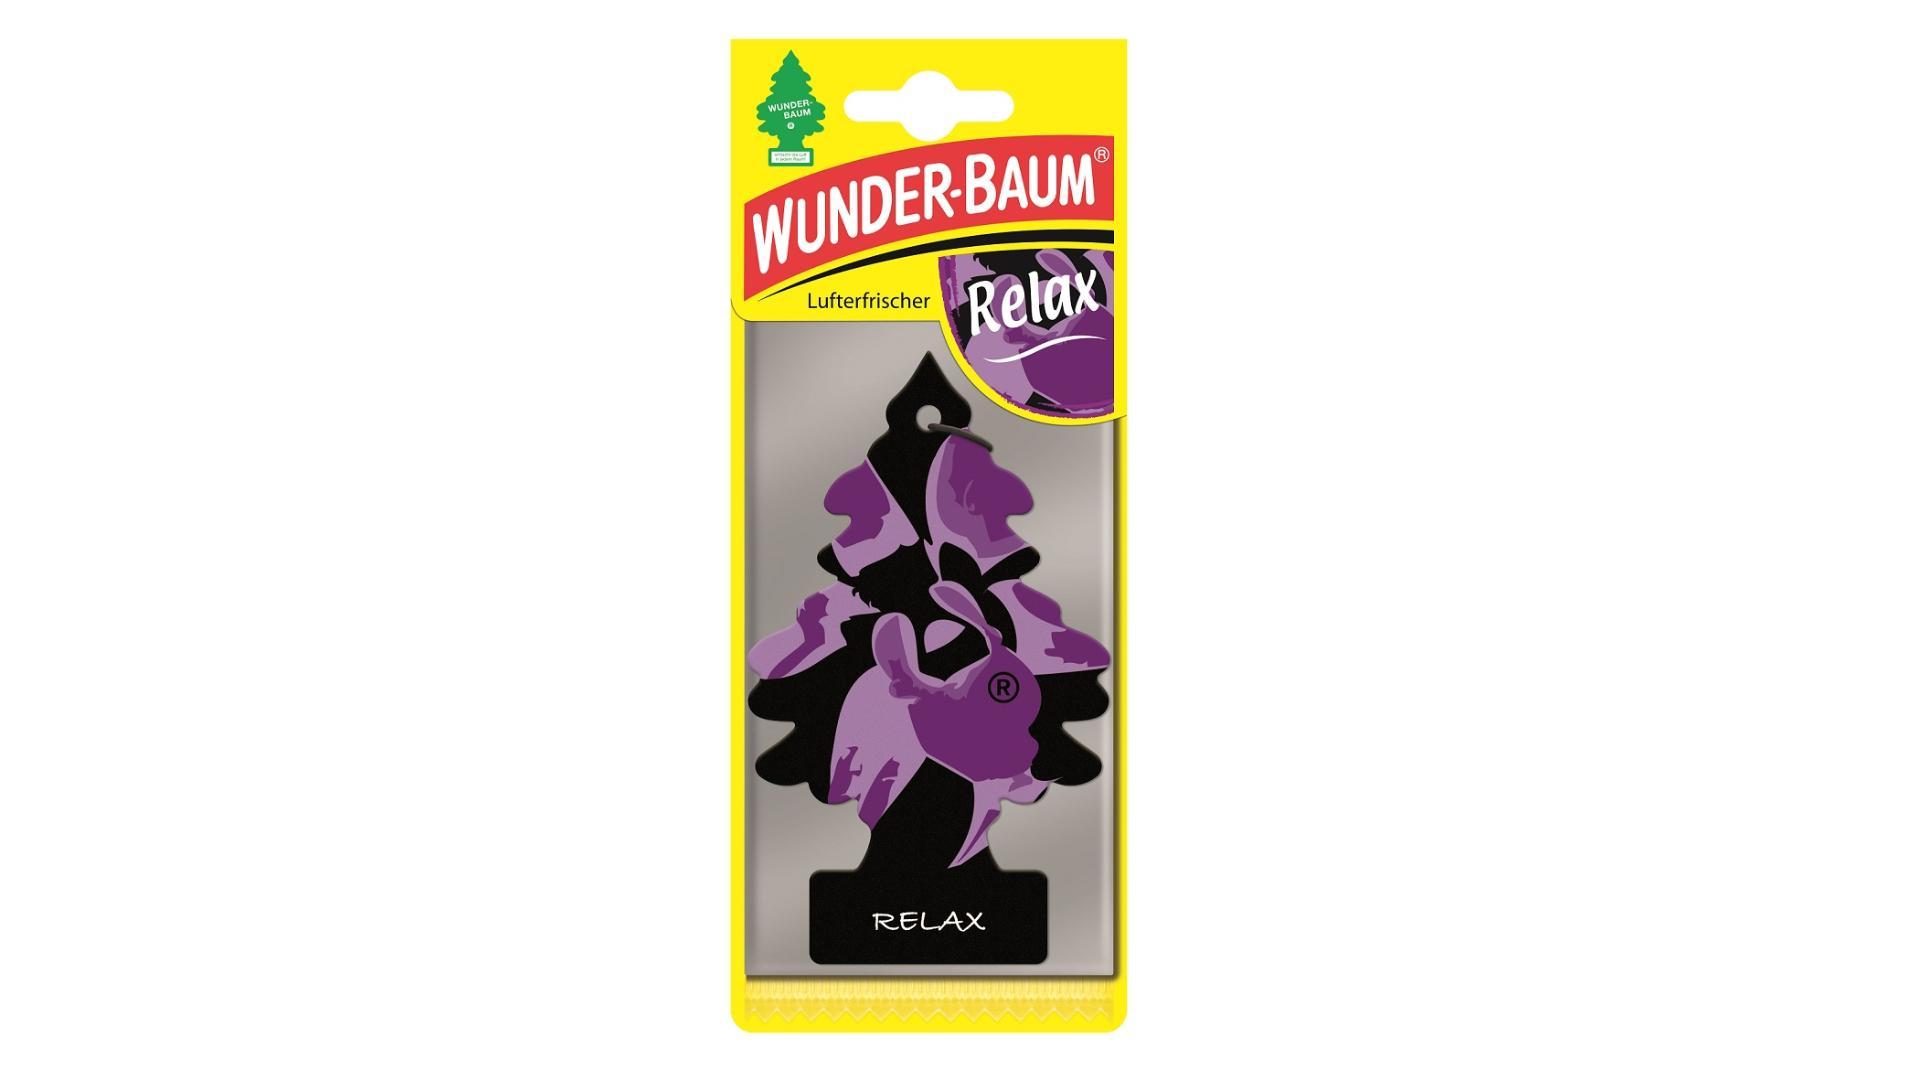 WUNDER BAUM Osvěžovač vzduchu Relax